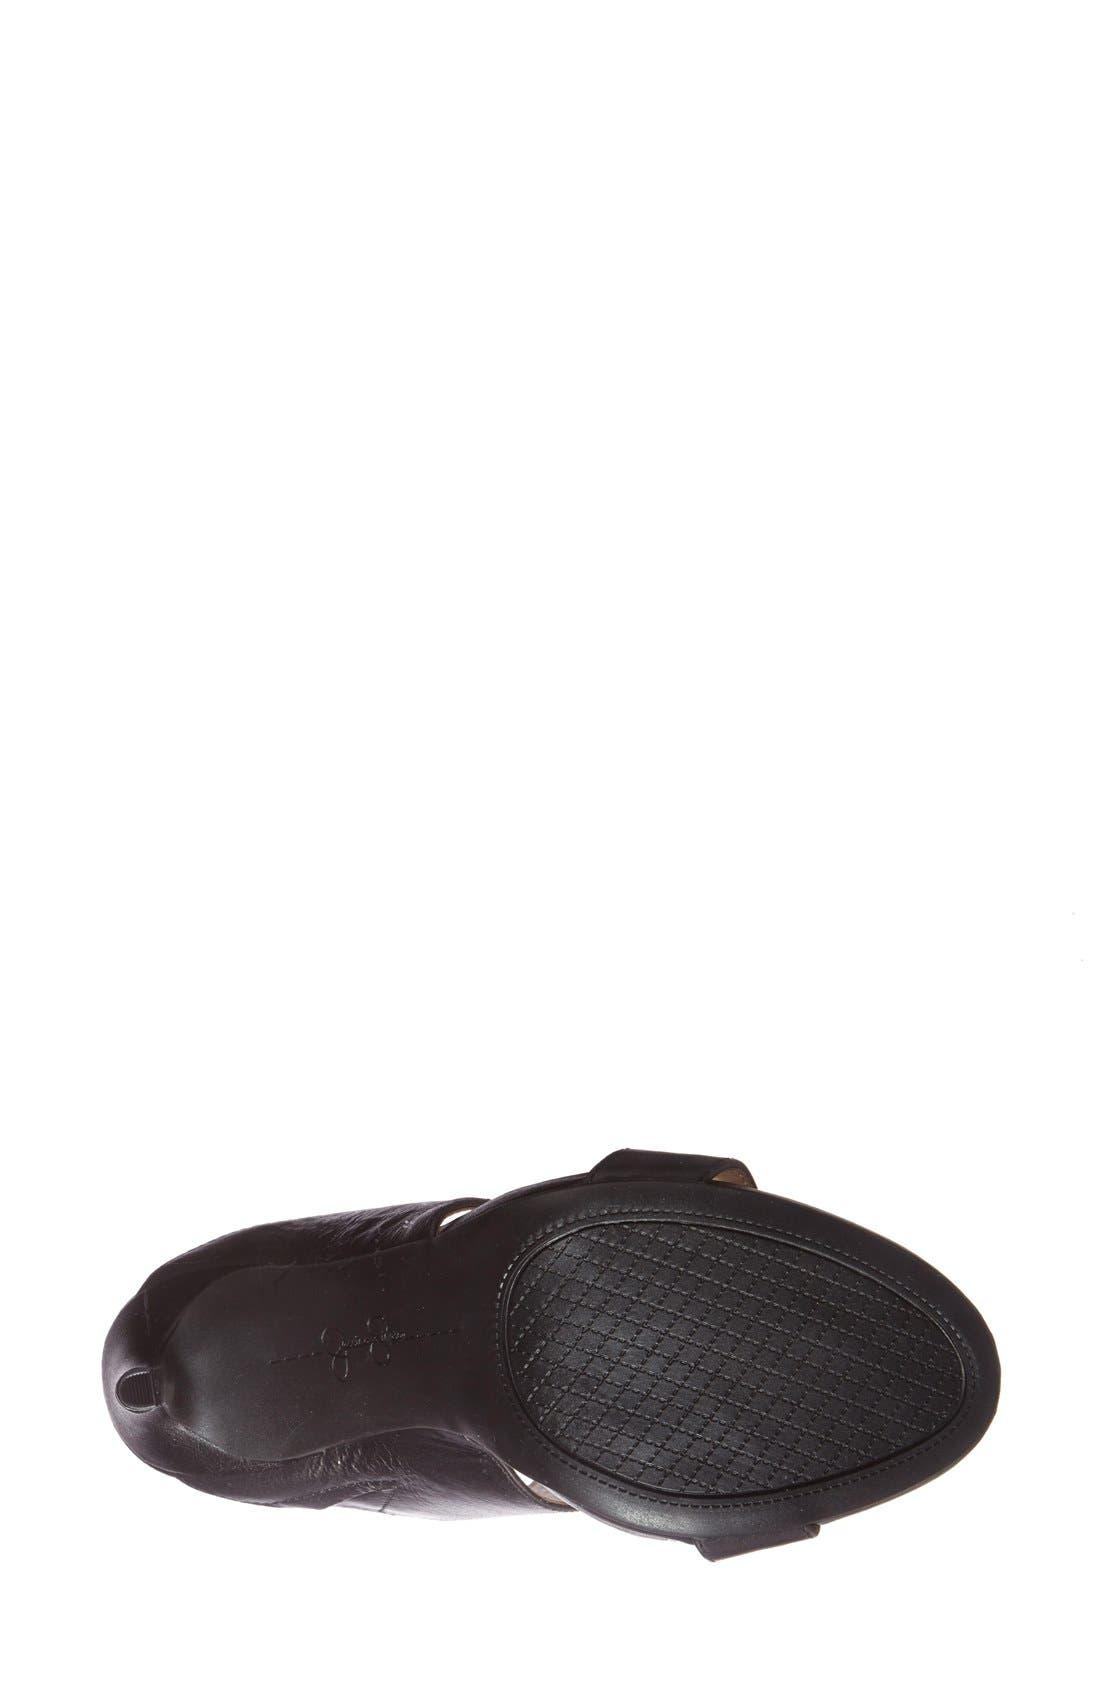 JESSICA SIMPSON,                             'Romy' Leather Platform Mule,                             Alternate thumbnail 2, color,                             001